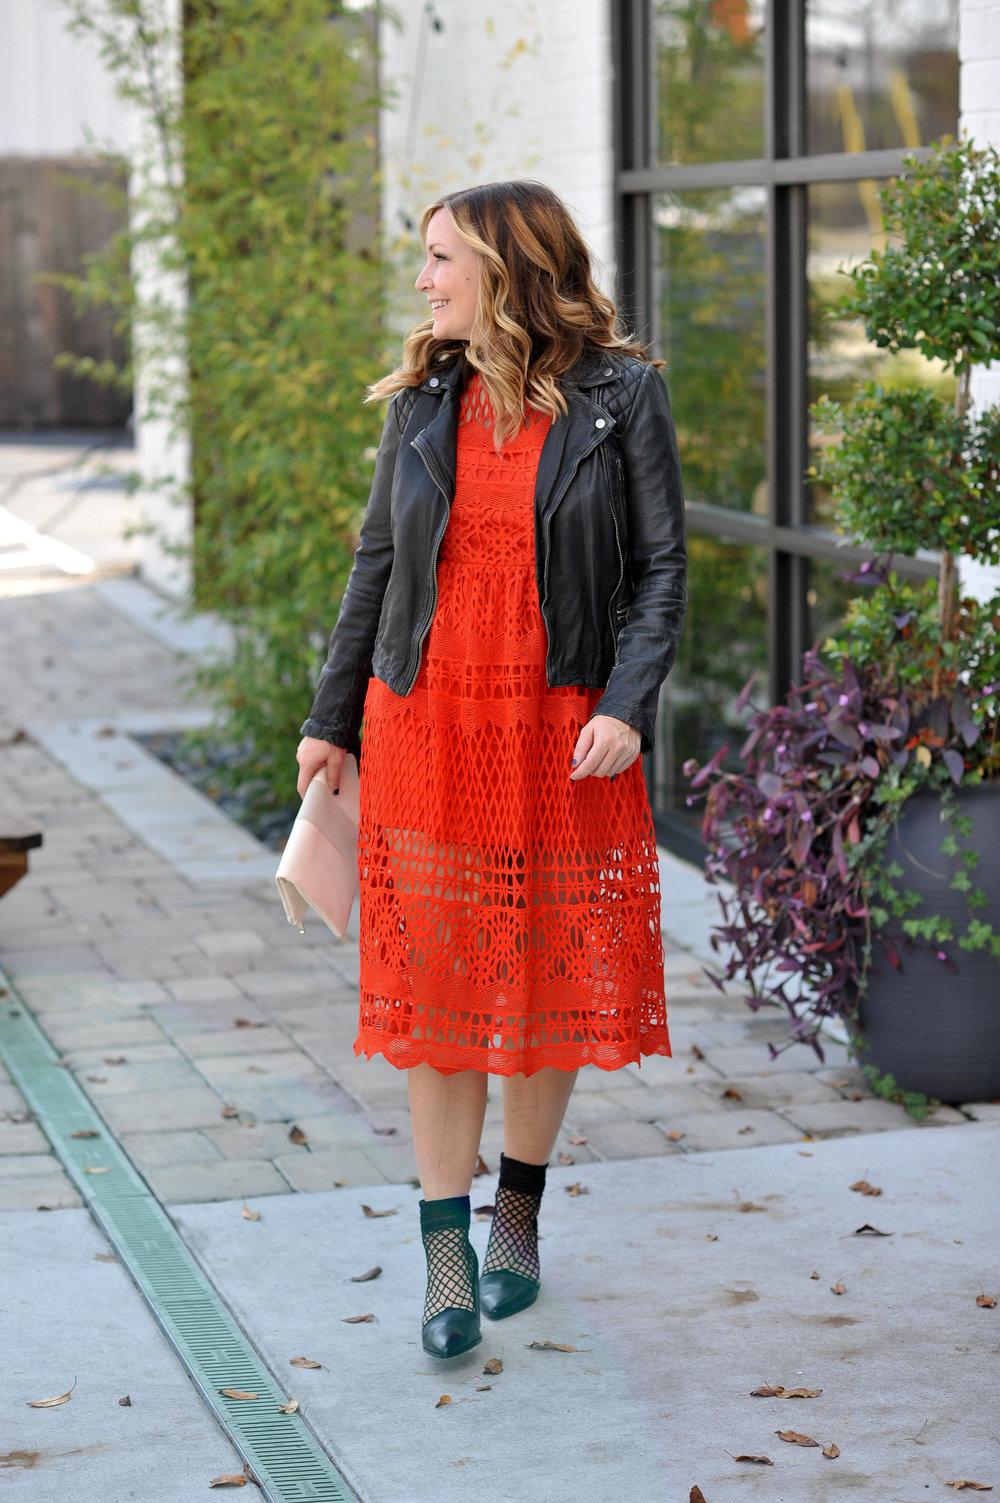 red dress 4.jpg